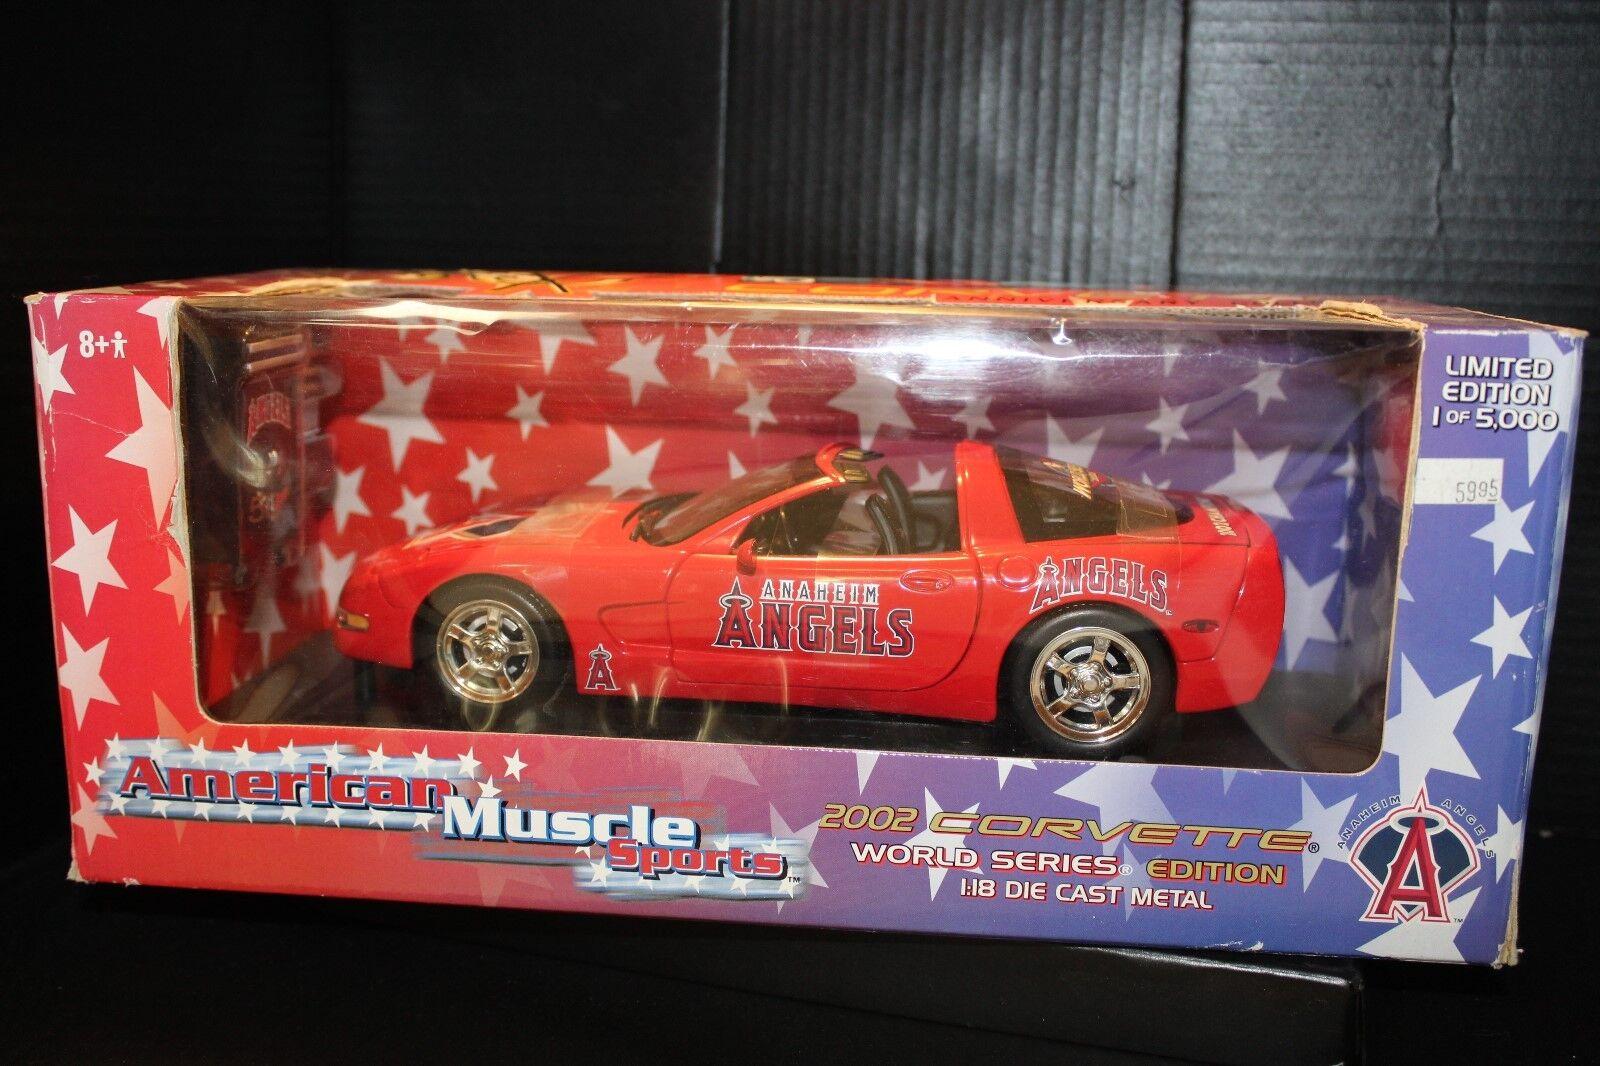 American muscle 2002 Corvetter World Series Edition